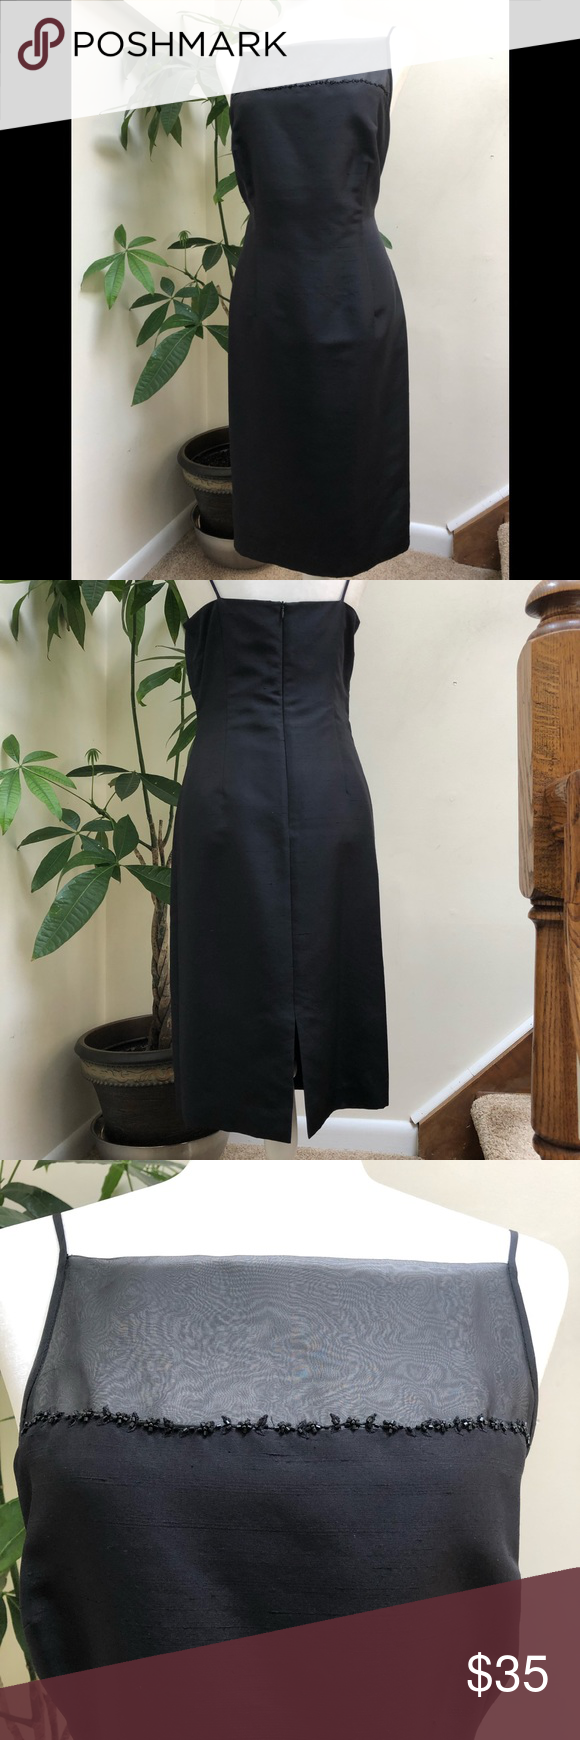 Liz Claiborne Black Dress Liz Claiborne Black Spaghetti Strap Dress Liz Claiborne Dresses [ 1740 x 580 Pixel ]